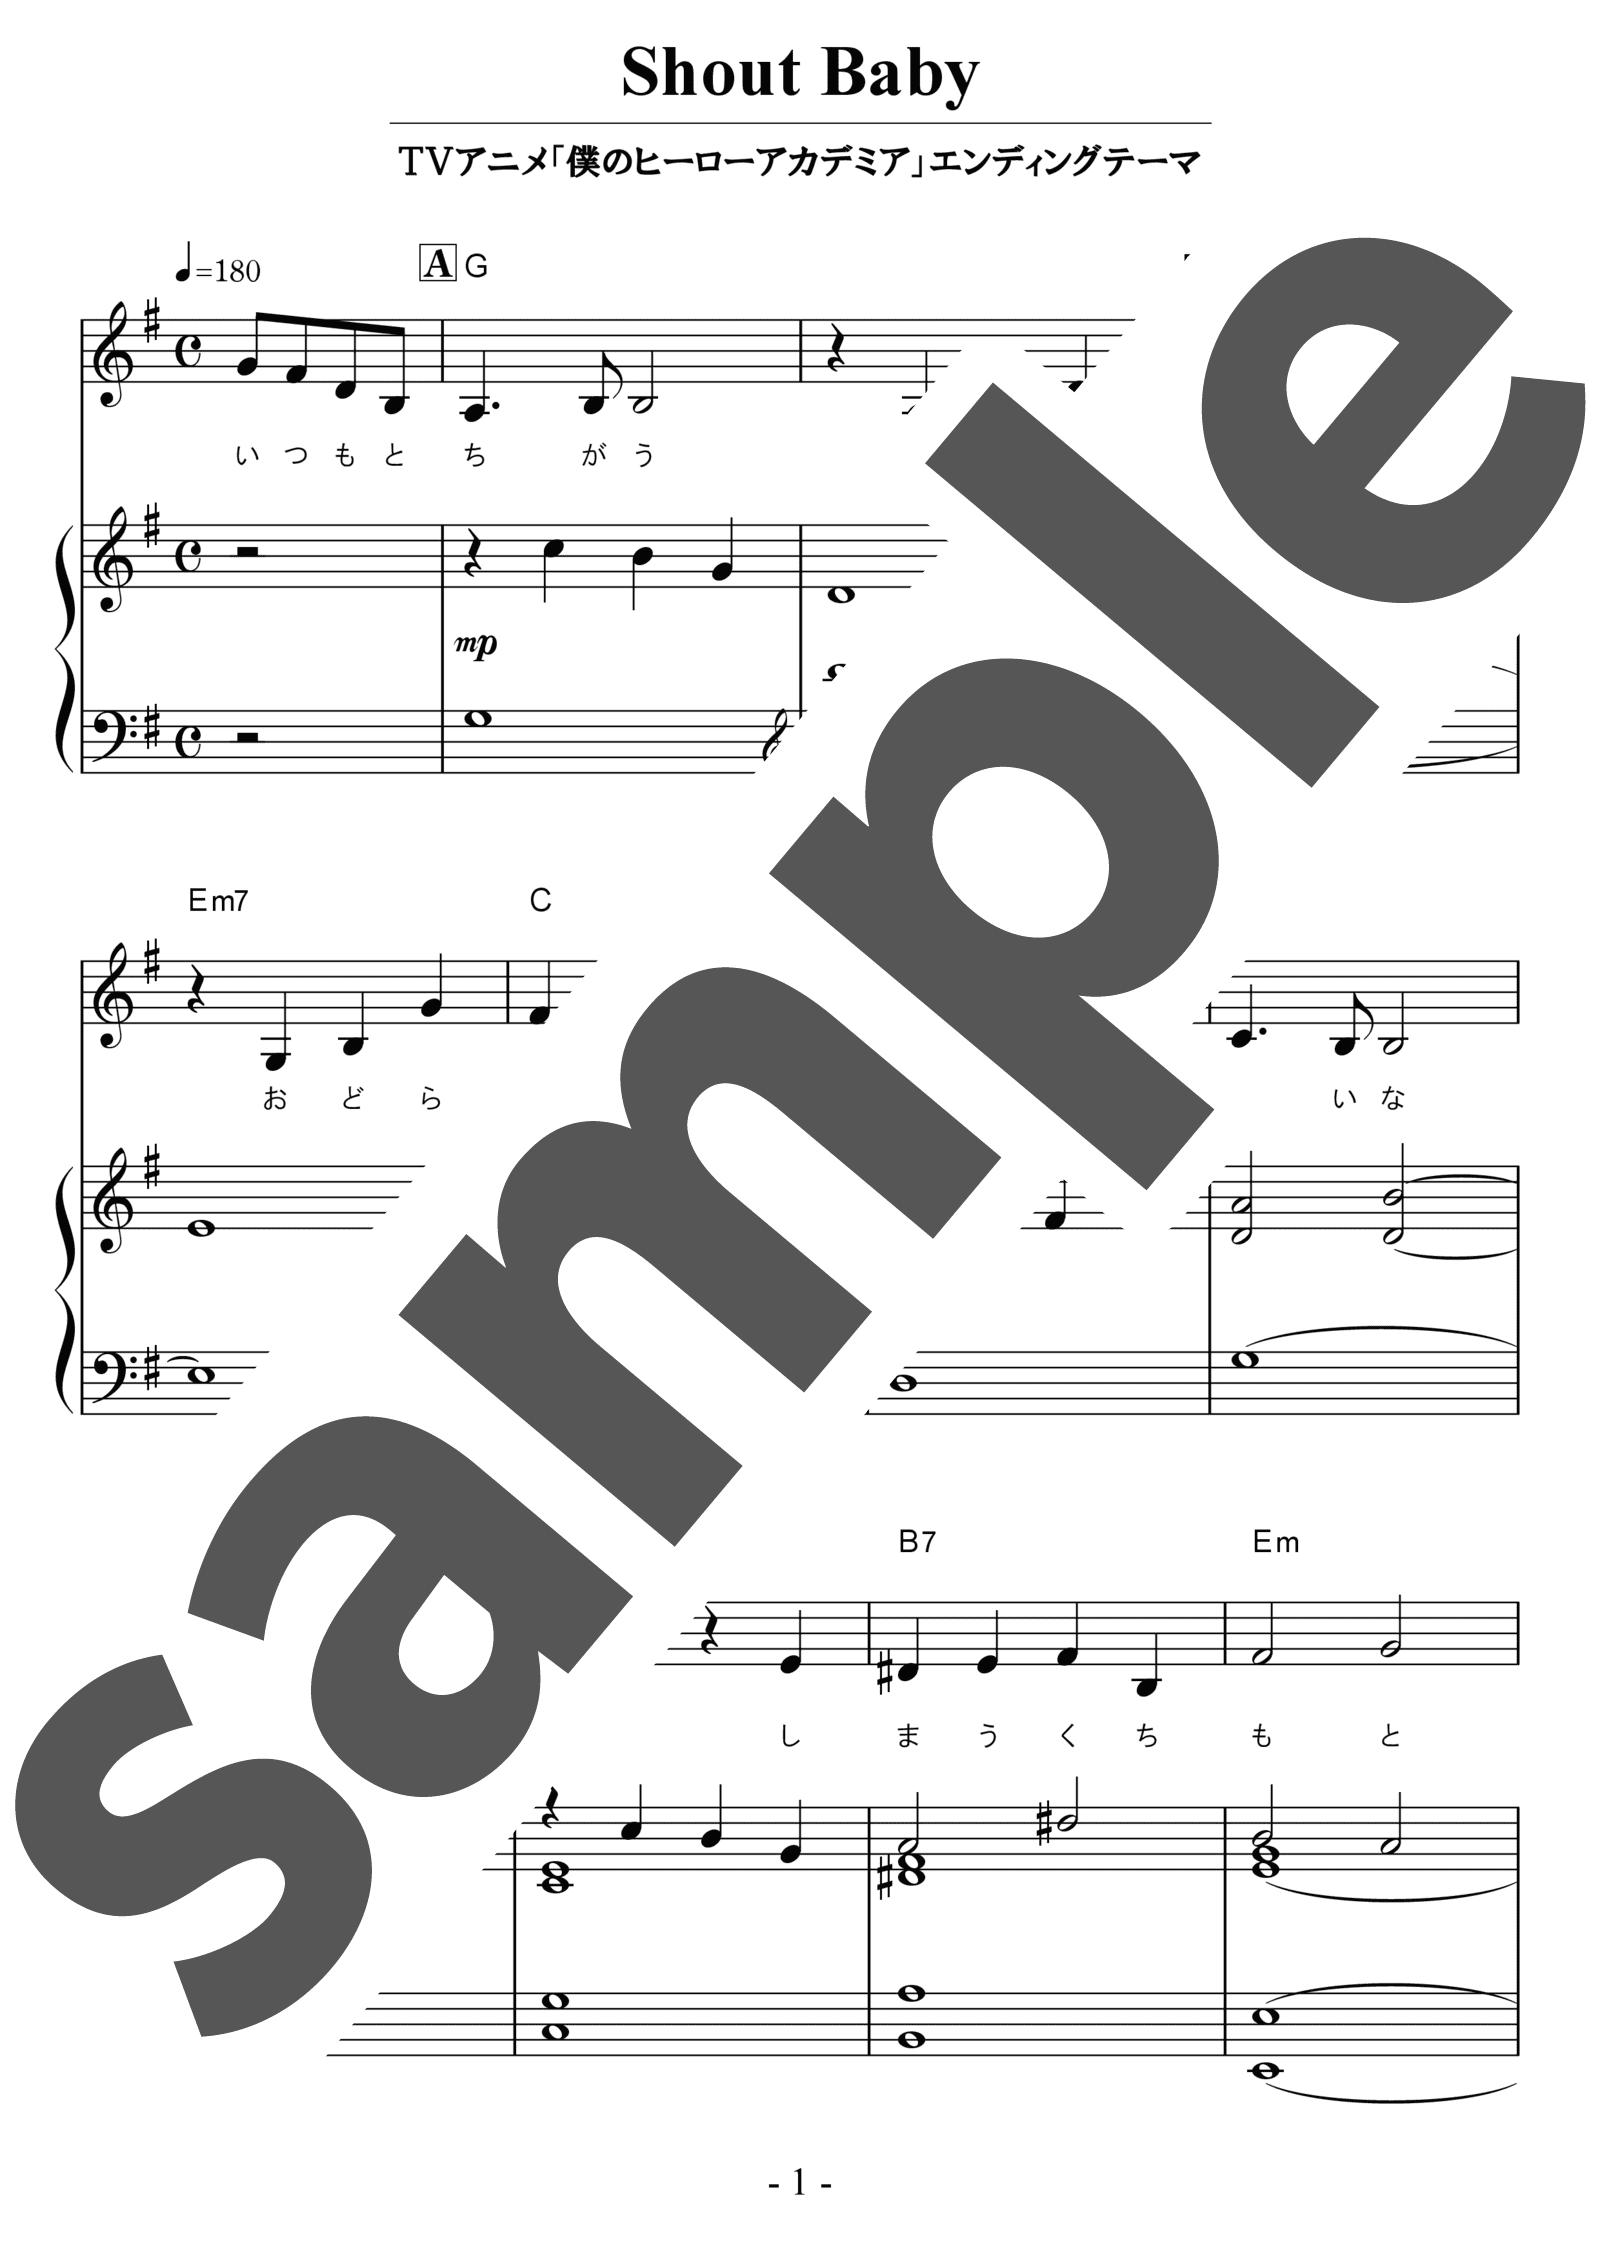 「Shout Baby」のサンプル楽譜